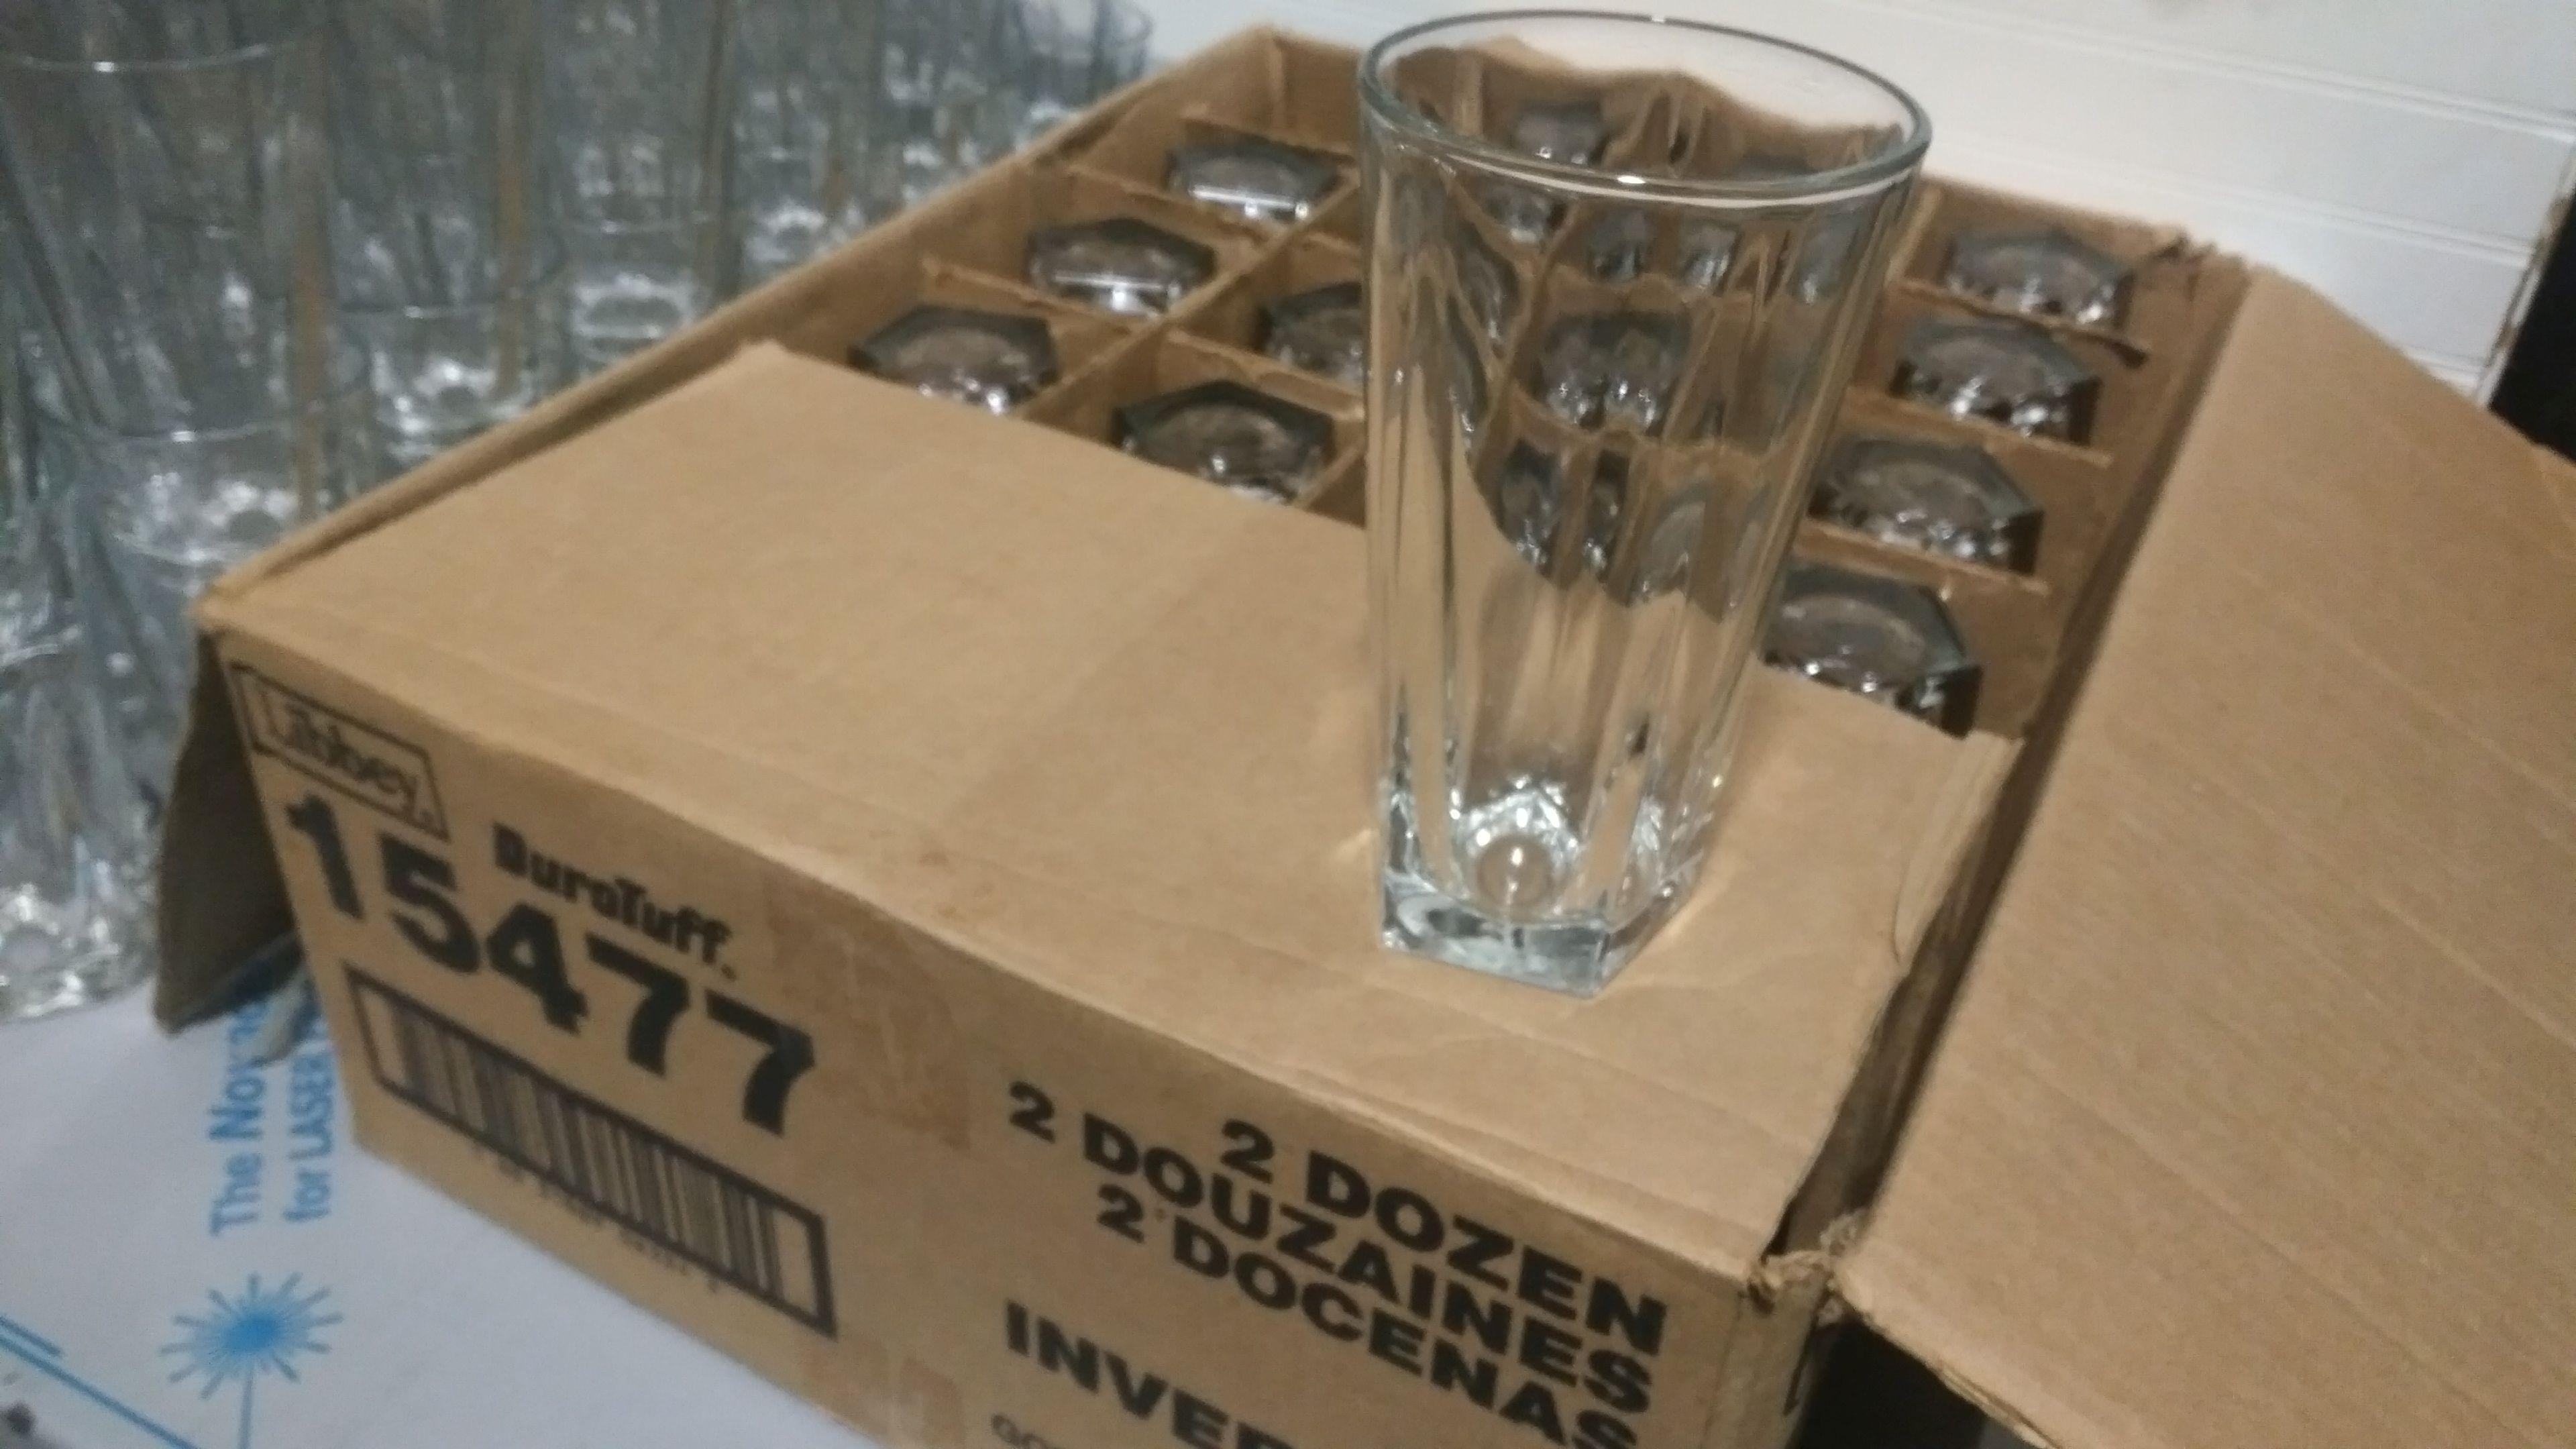 Lot 15 - Libbey 16oz DuraTuff Cooler Glasses - Lot of 24